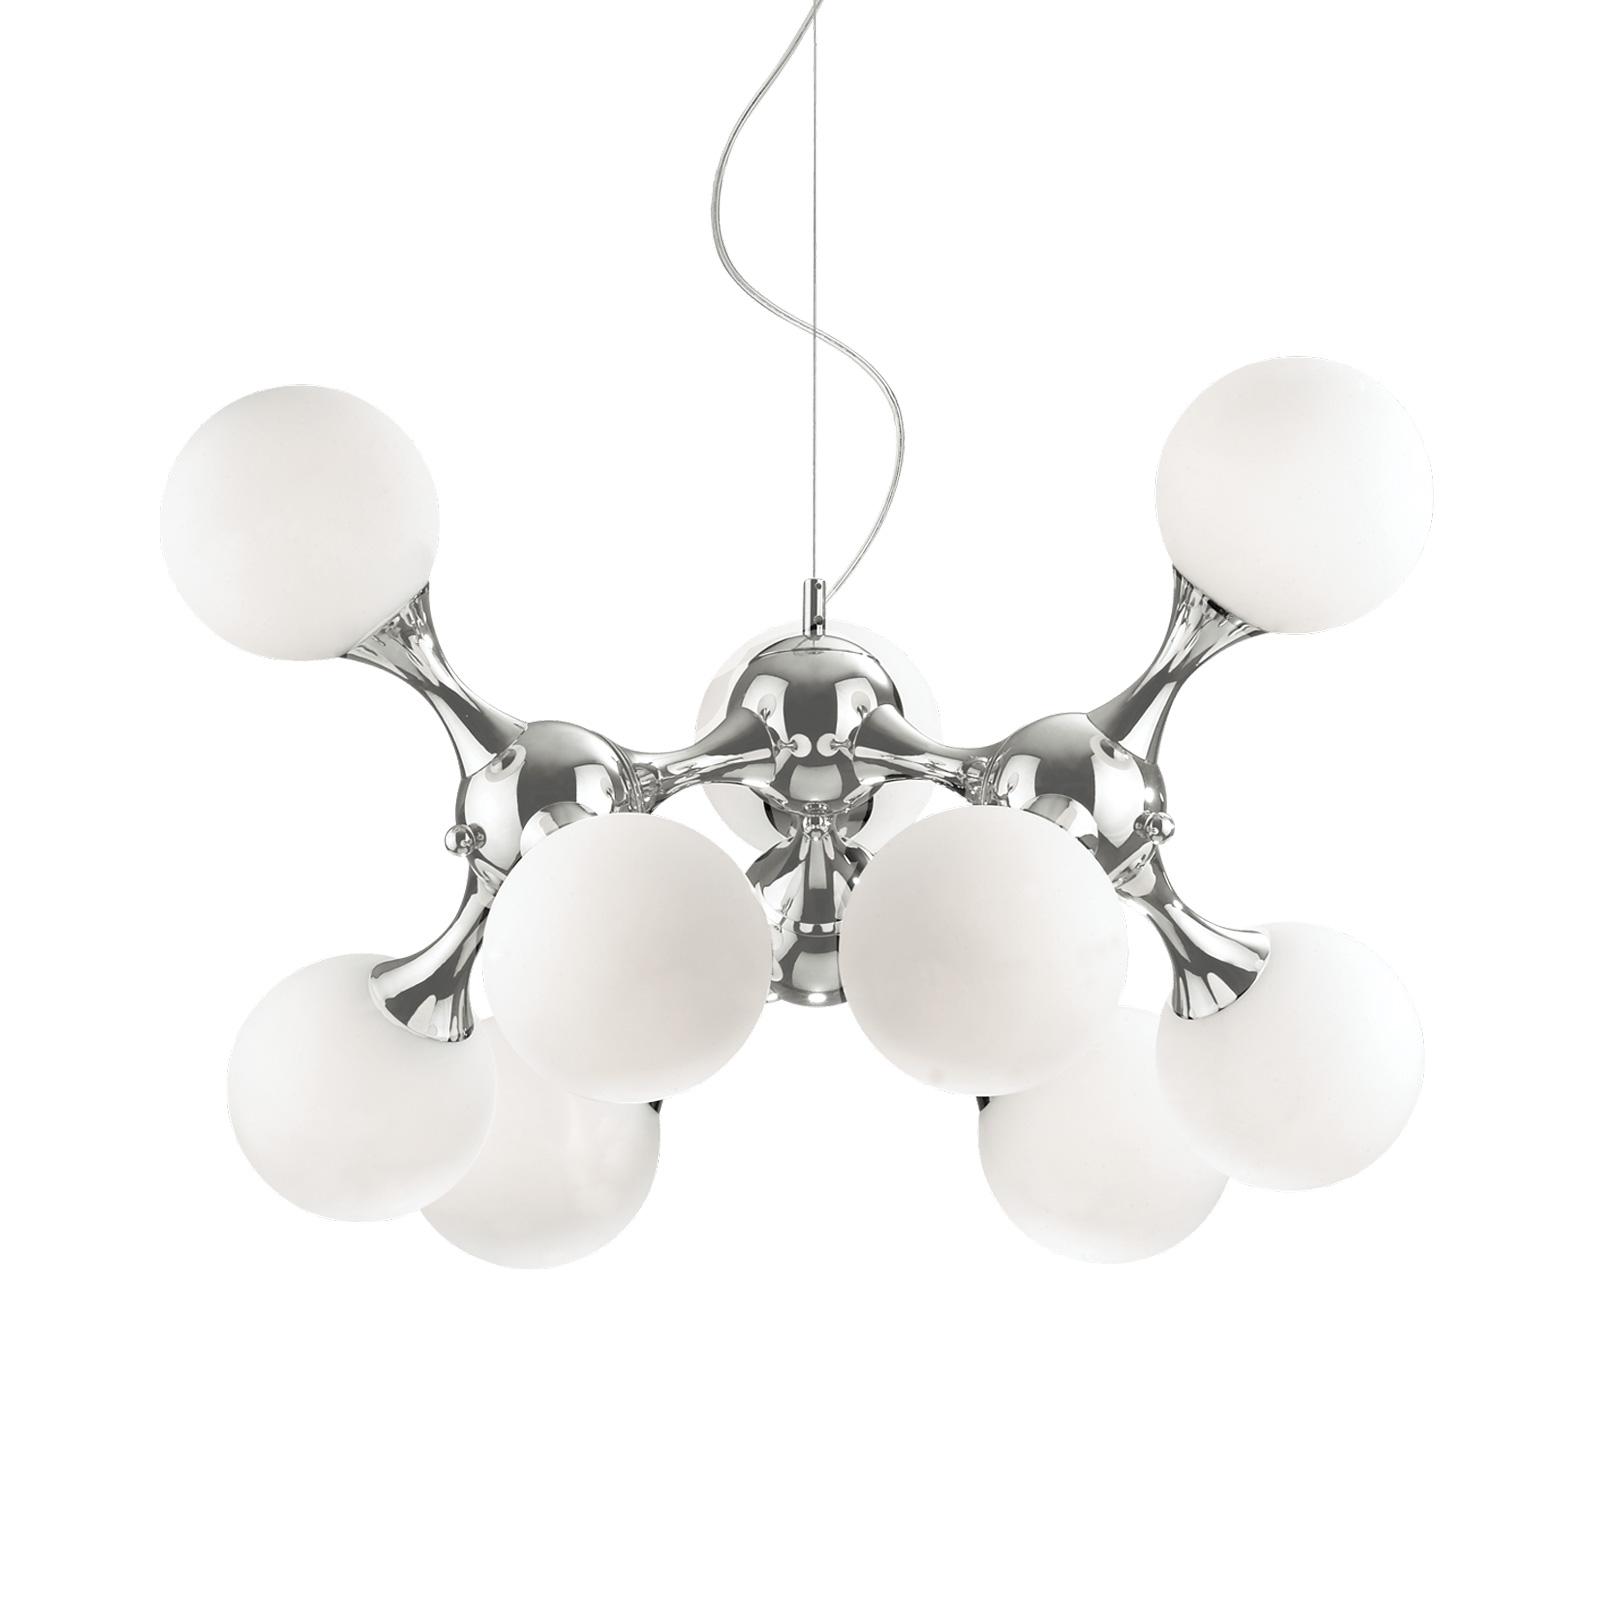 Hanglamp Nodi Bianco Ø 80 cm